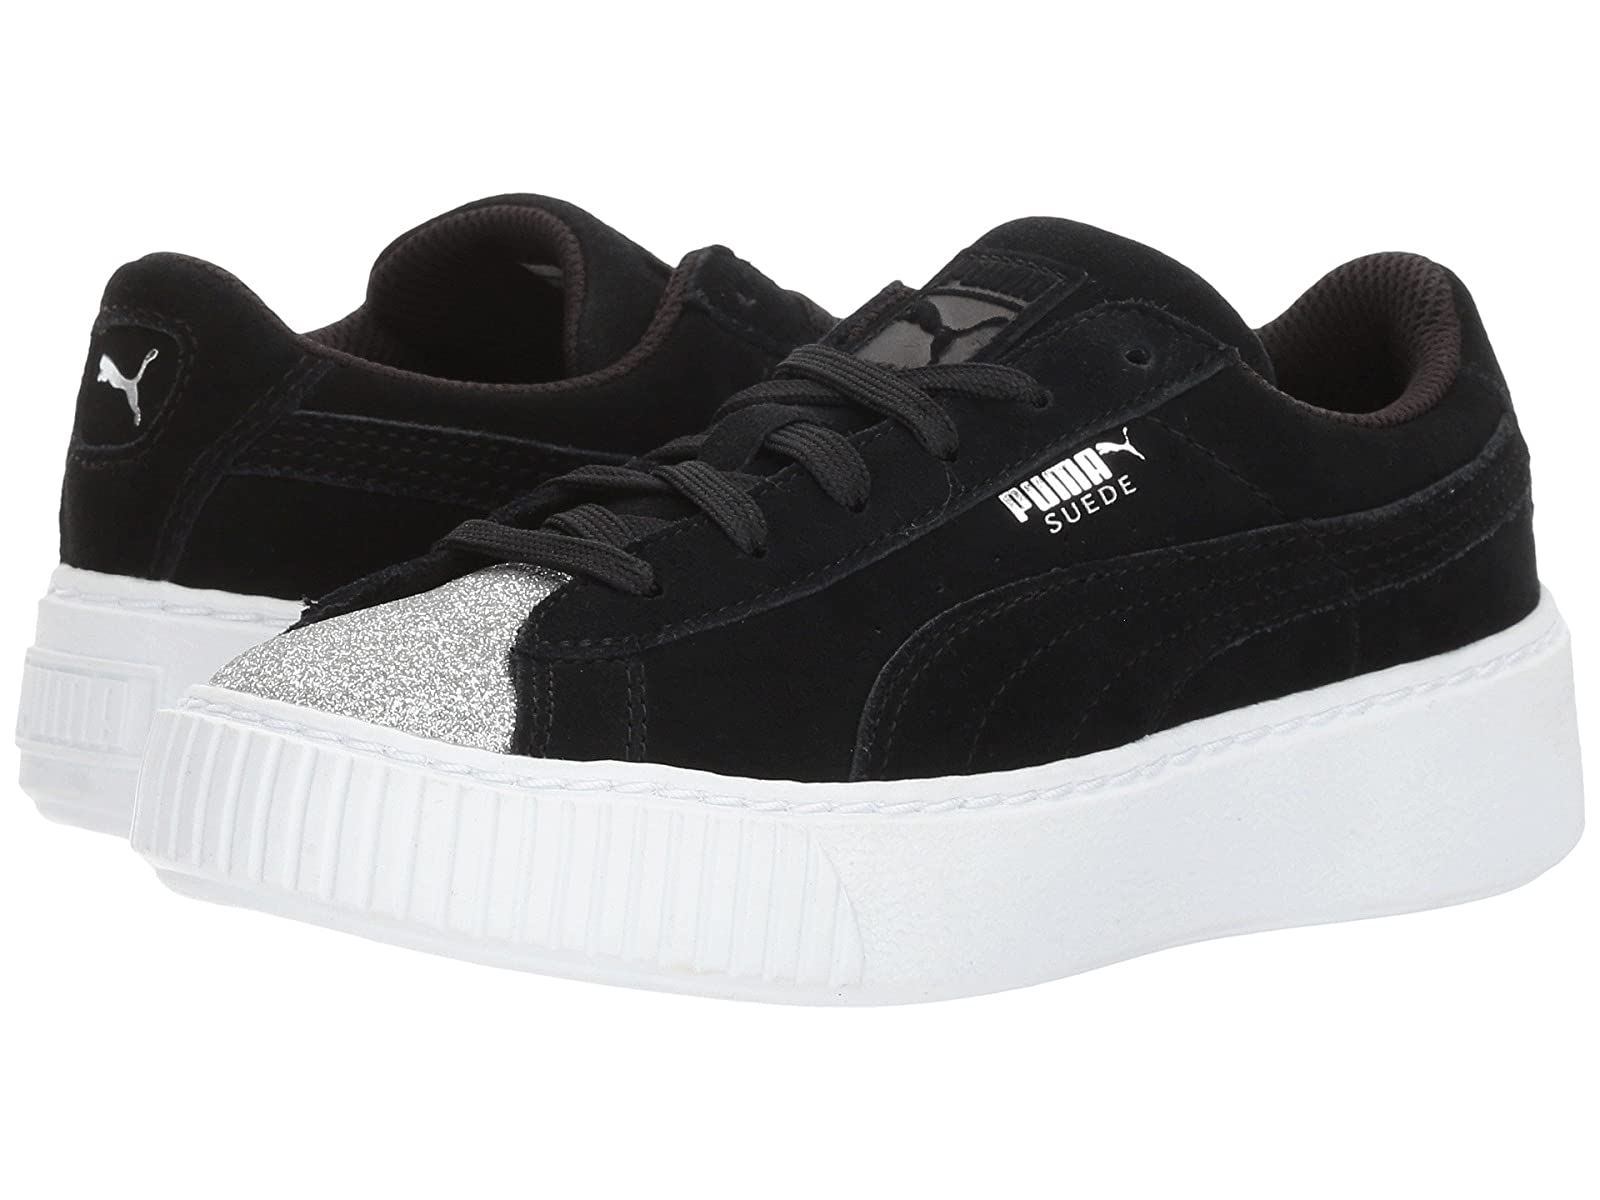 Puma Kids Suede Platform Glam (Little Kid/Big Kid)Cheap and distinctive eye-catching shoes